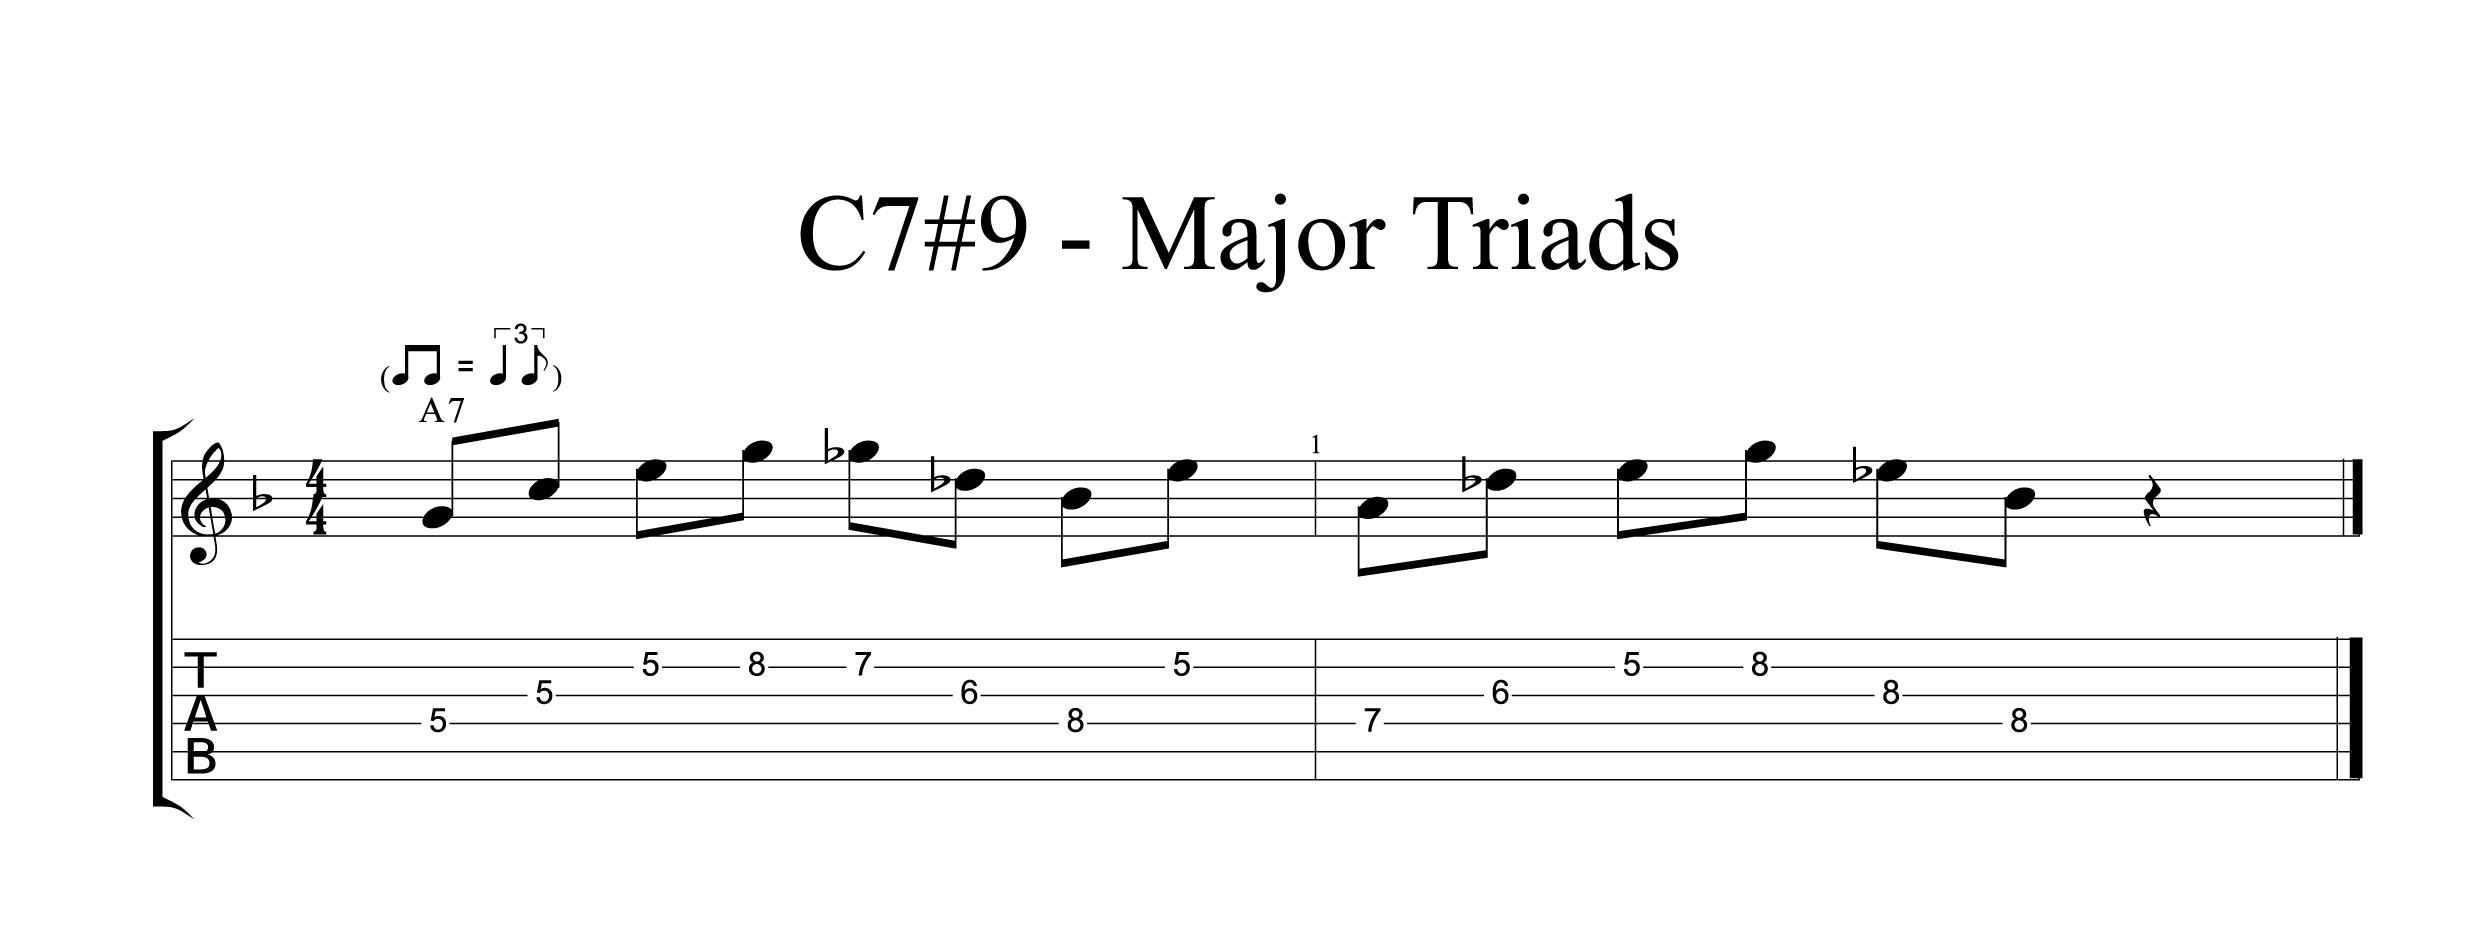 C7#9 - Major Triads